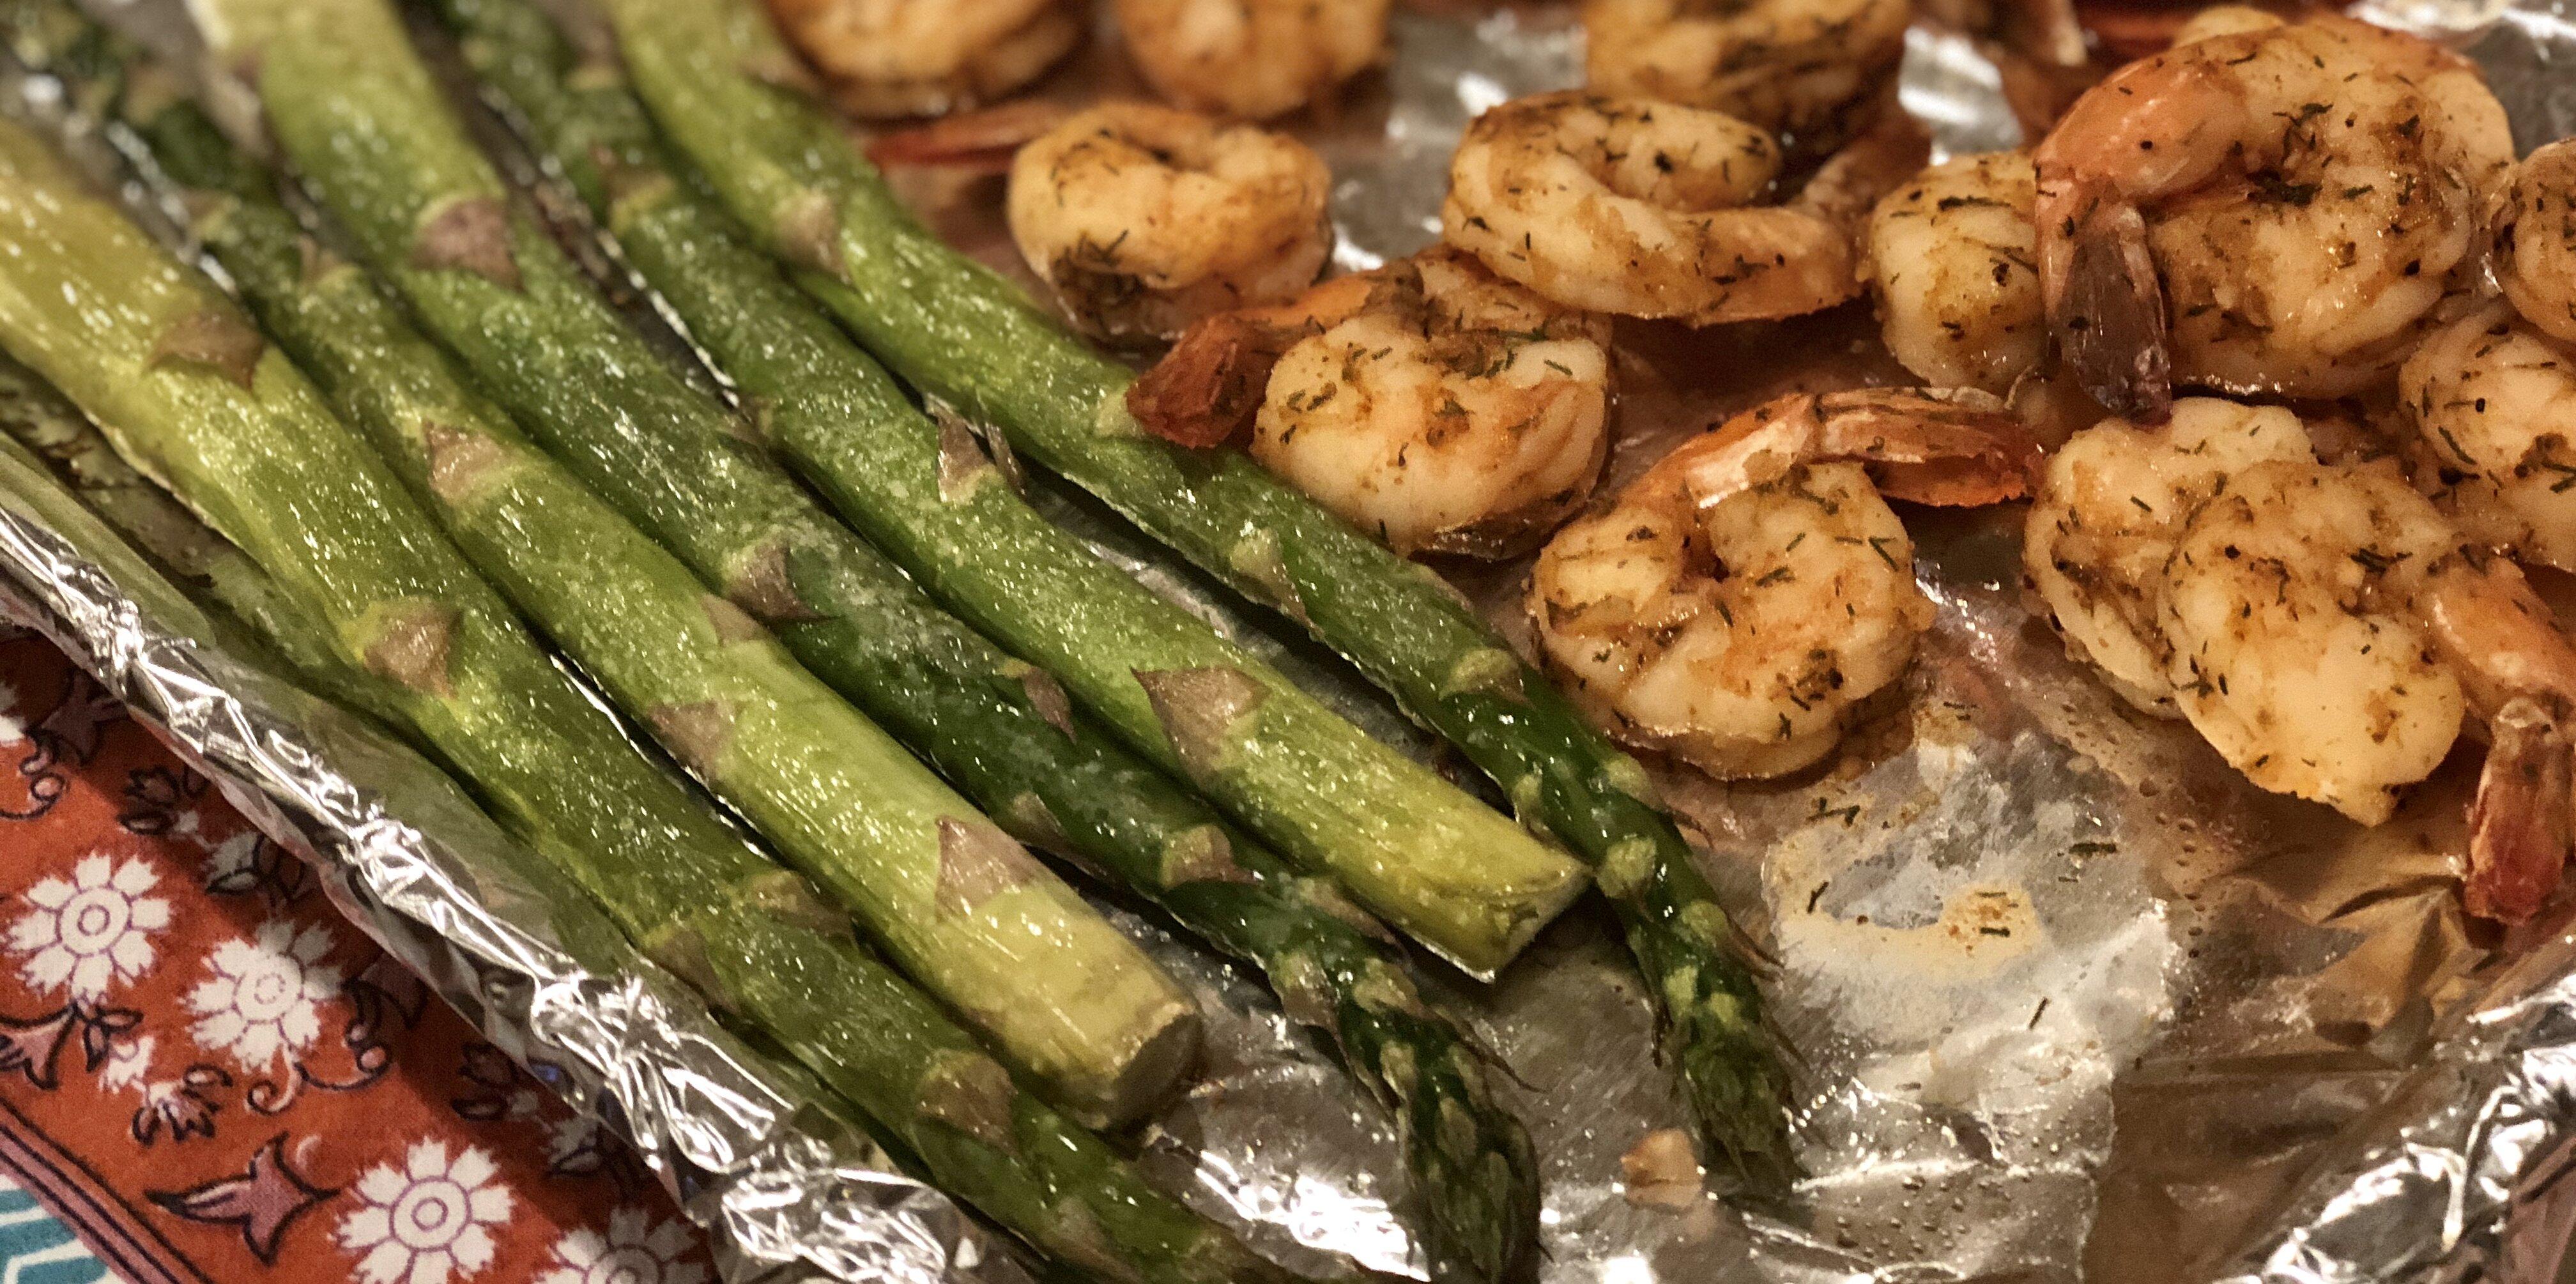 back to sheet pan lemon butter garlic shrimp with asparagus recipe